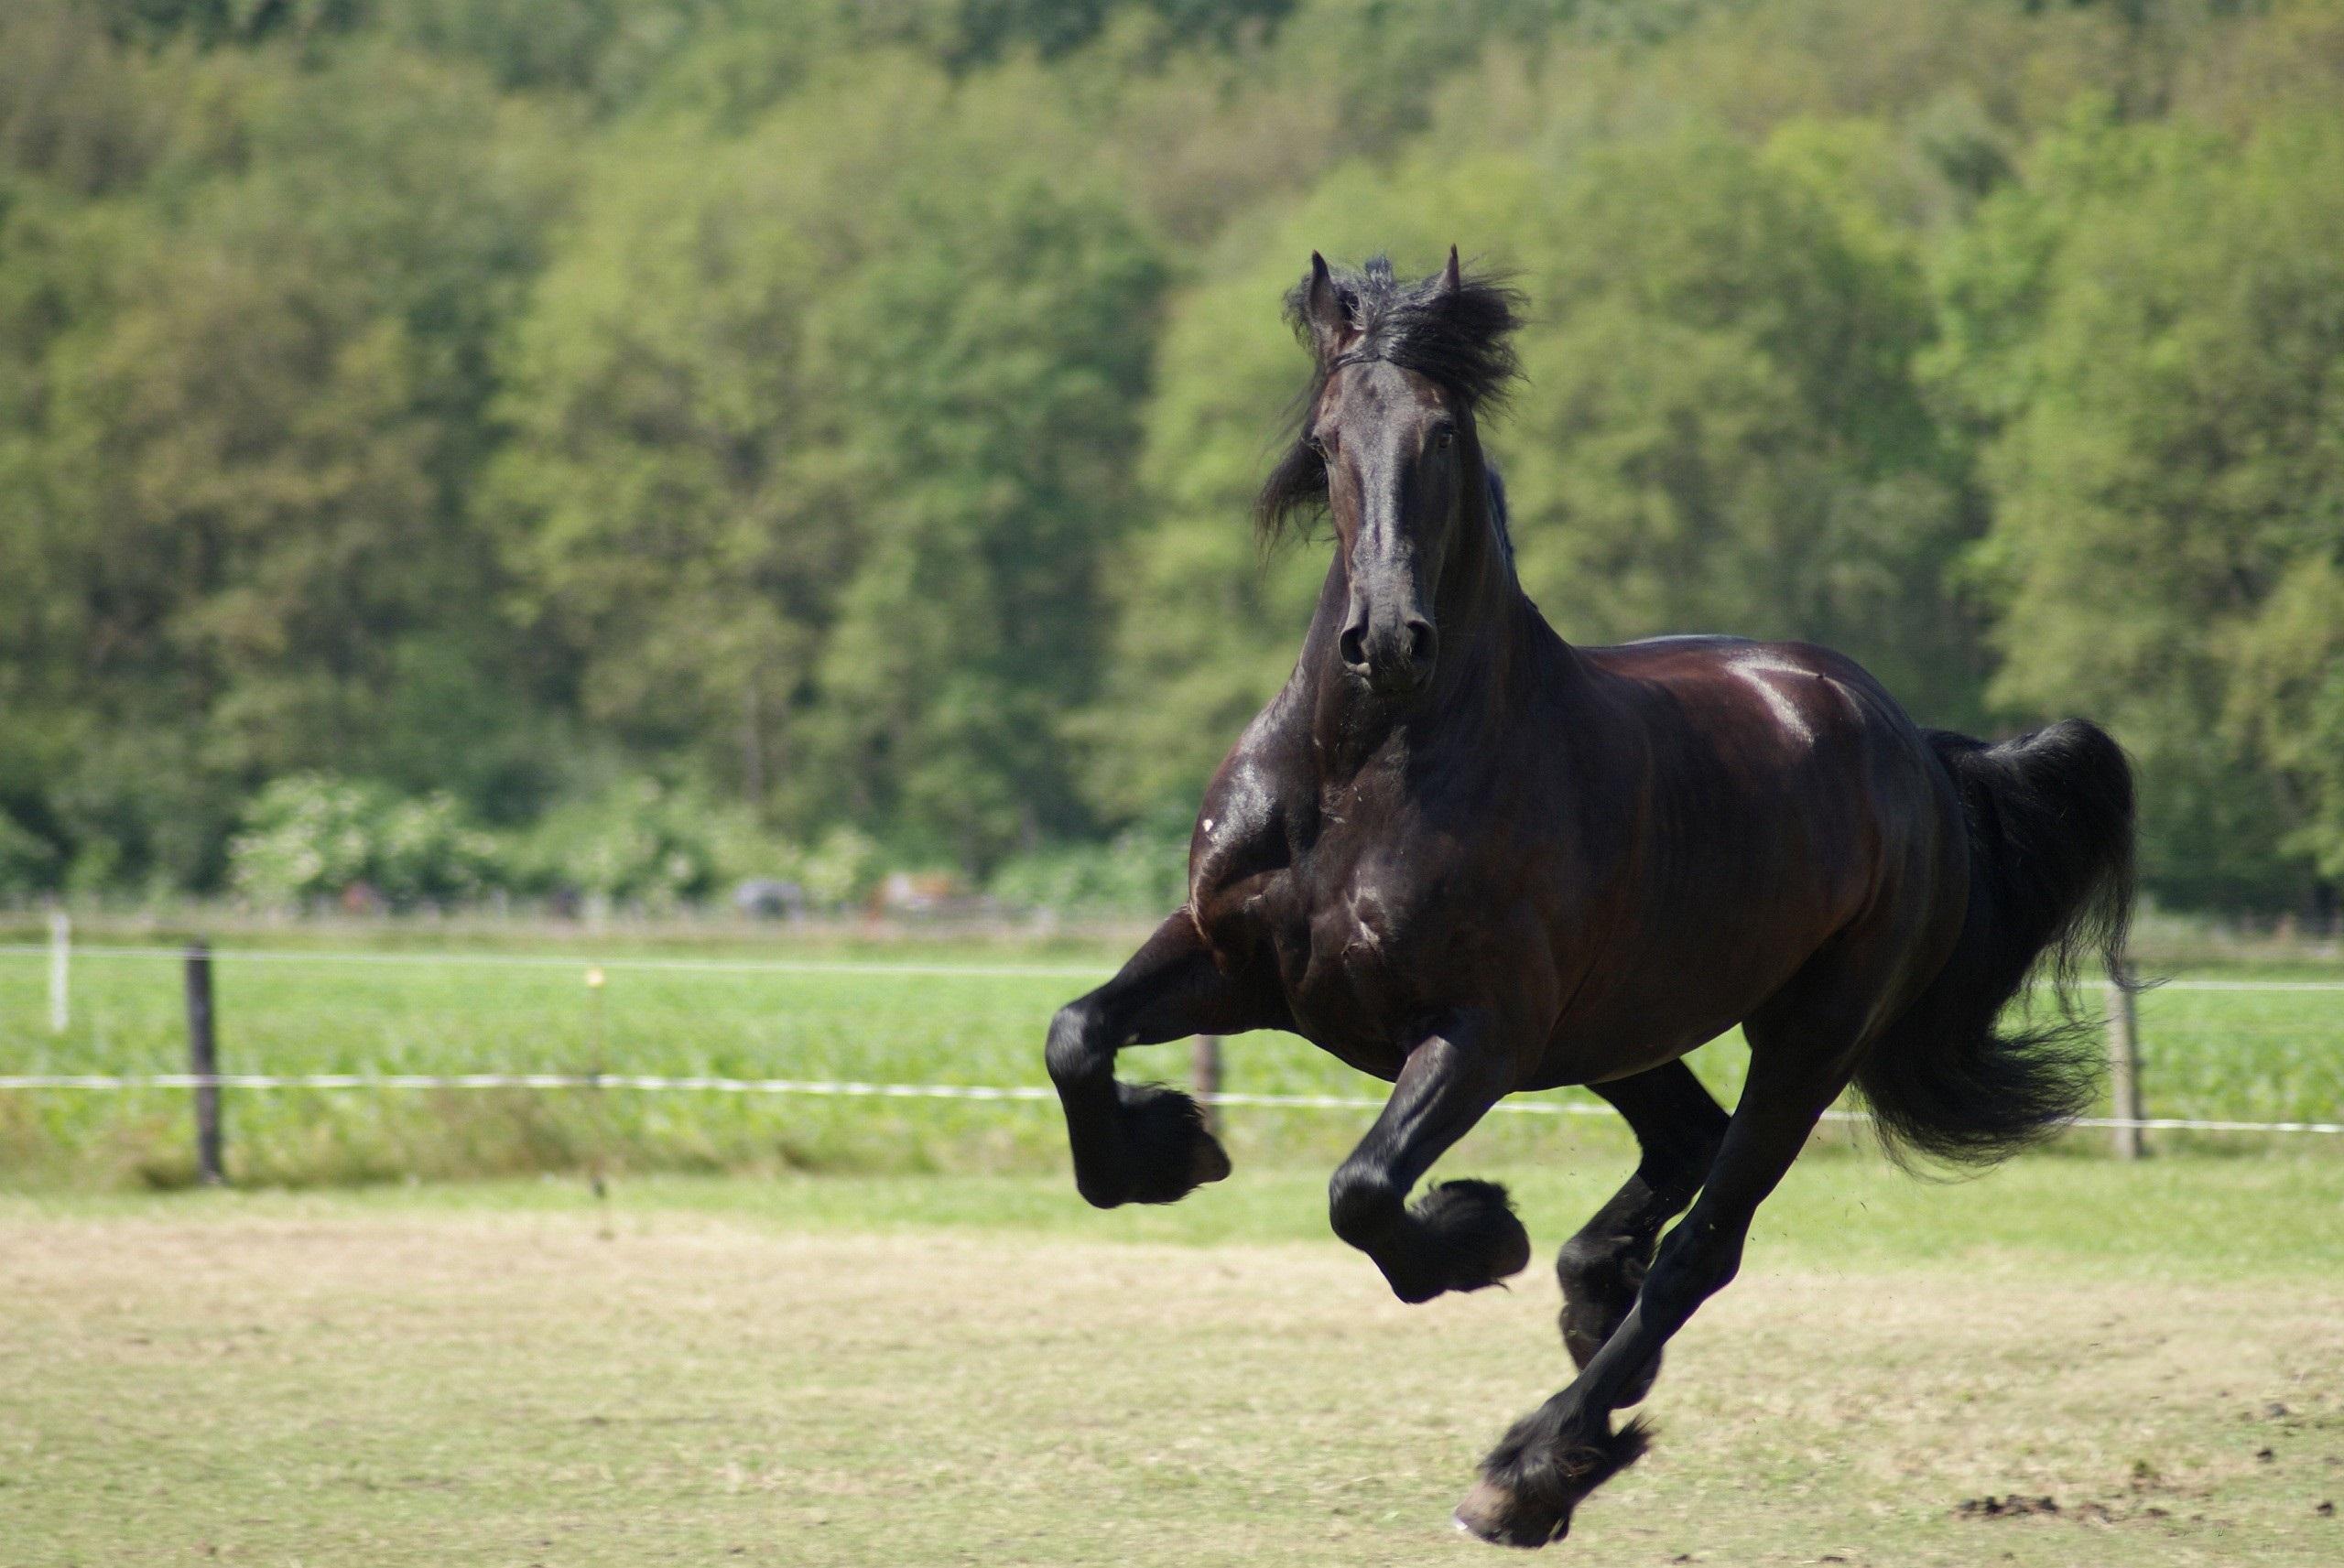 Black Horse 32519 2560x1713 Px HDWallSource